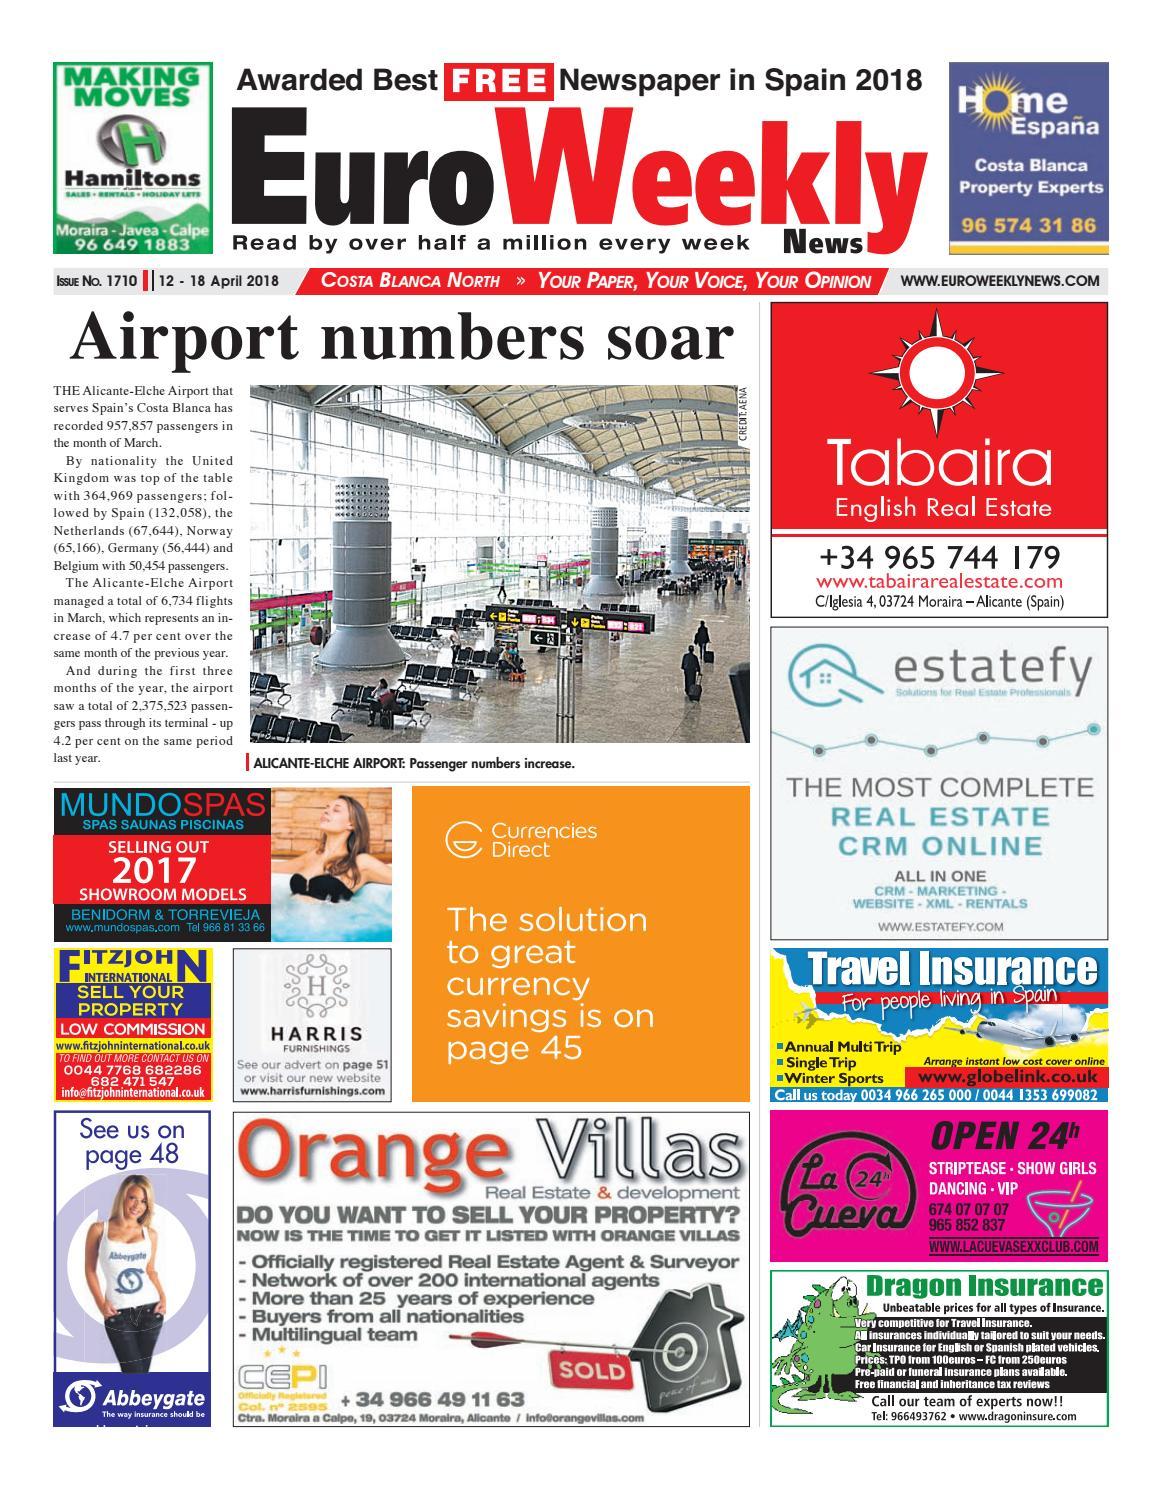 Euro Weekly News Costa Blanca North 12 18 April 2018